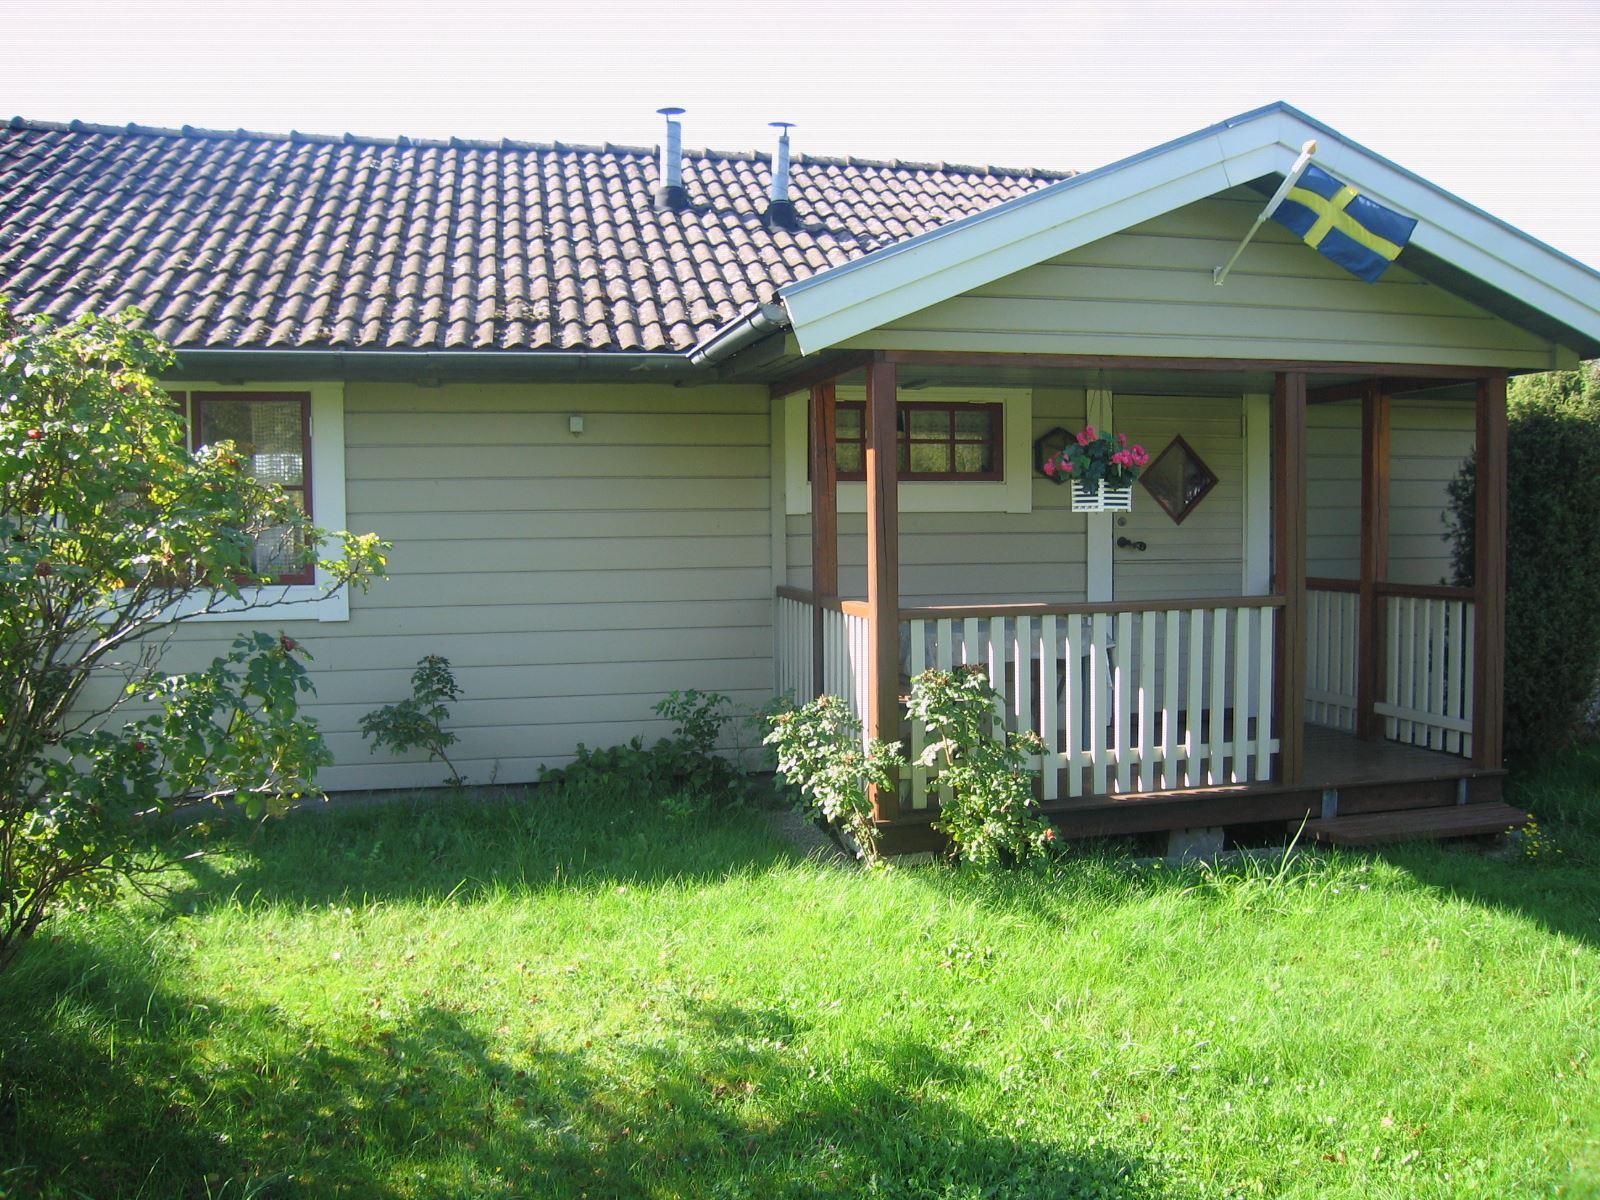 O171020* Rosenborg